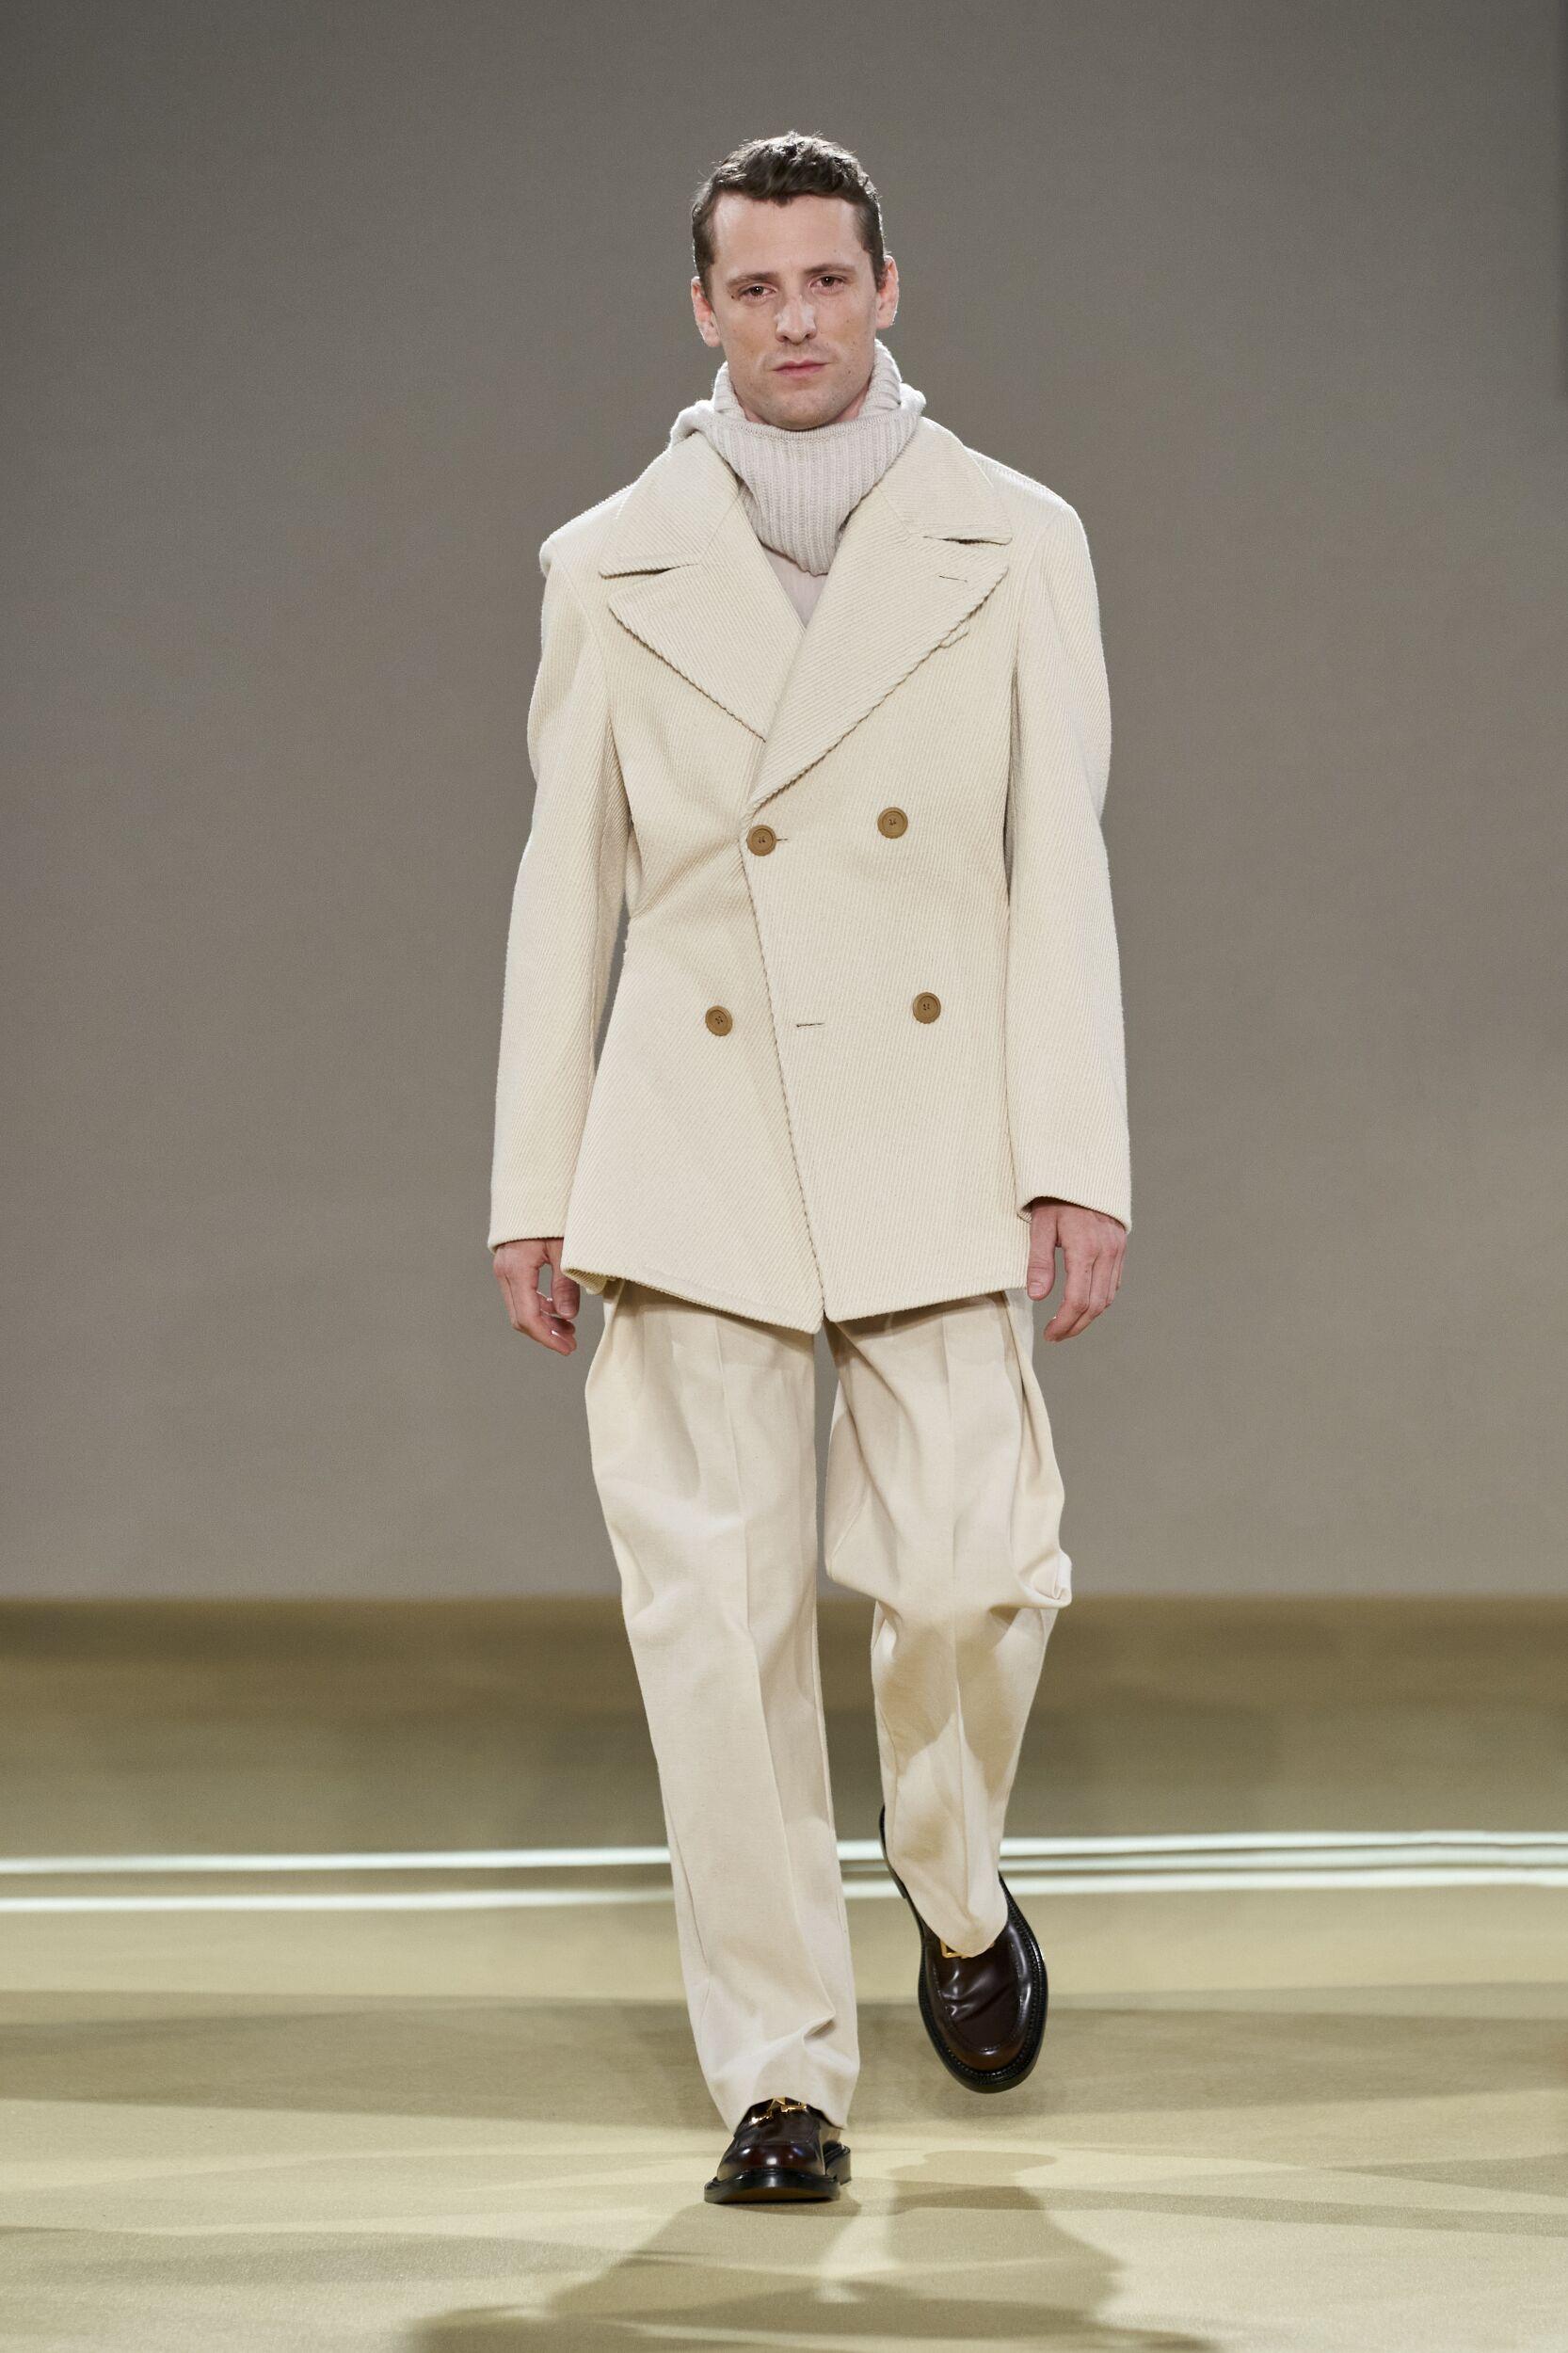 Fashion Show Man Model Salvatore Ferragamo Catwalk